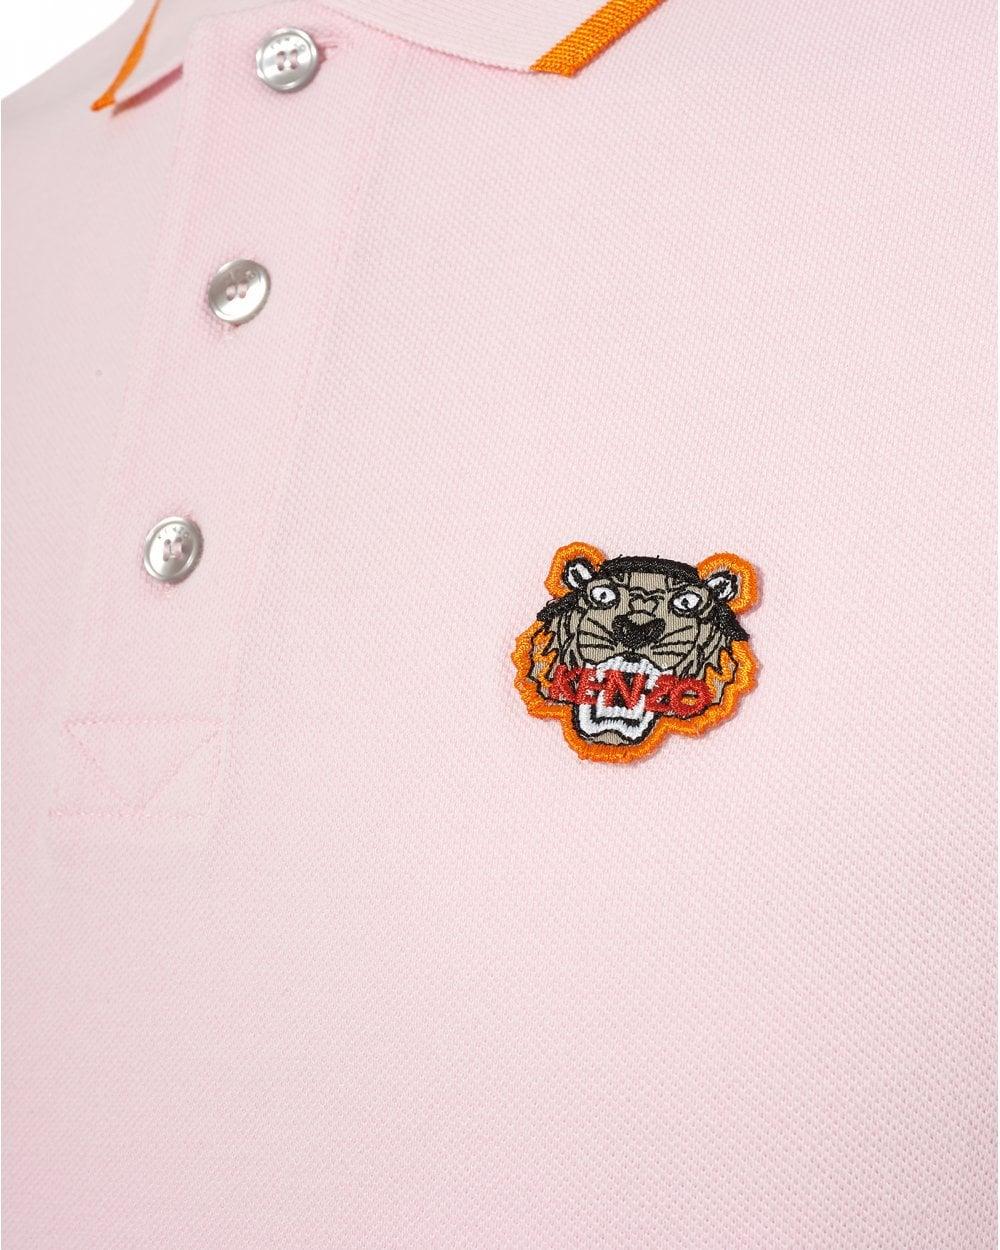 8f647b7b7 Kenzo Mens Tiger Polo Shirt, Tipped Regular Fit Pink Polo